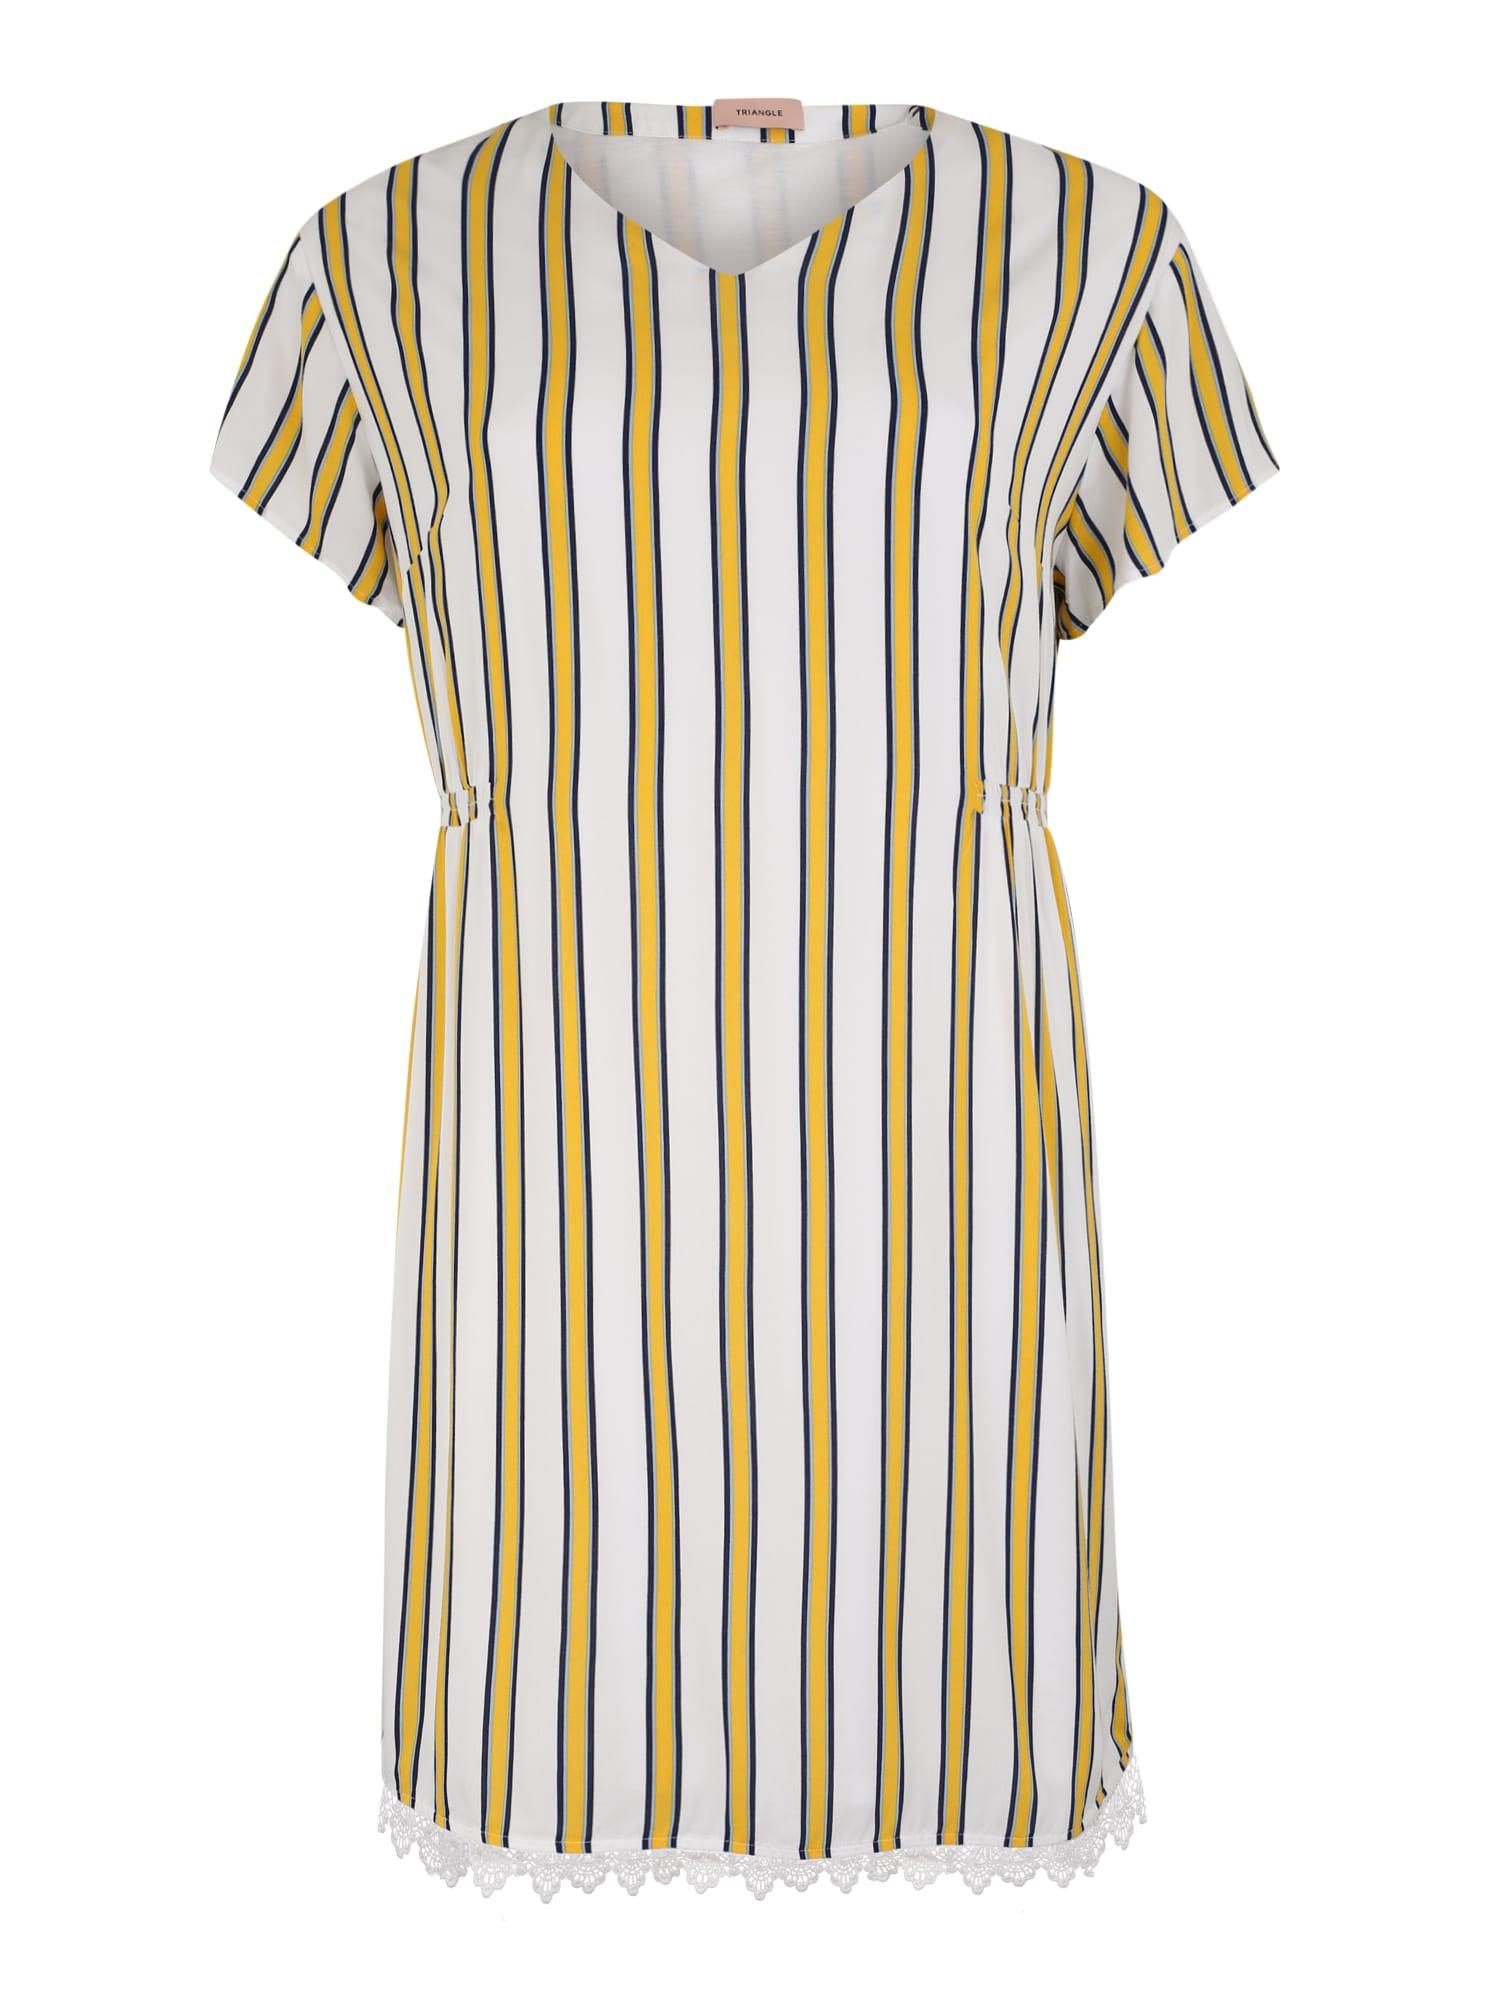 Šaty KLEID KURZ žlutá bílá TRIANGLE